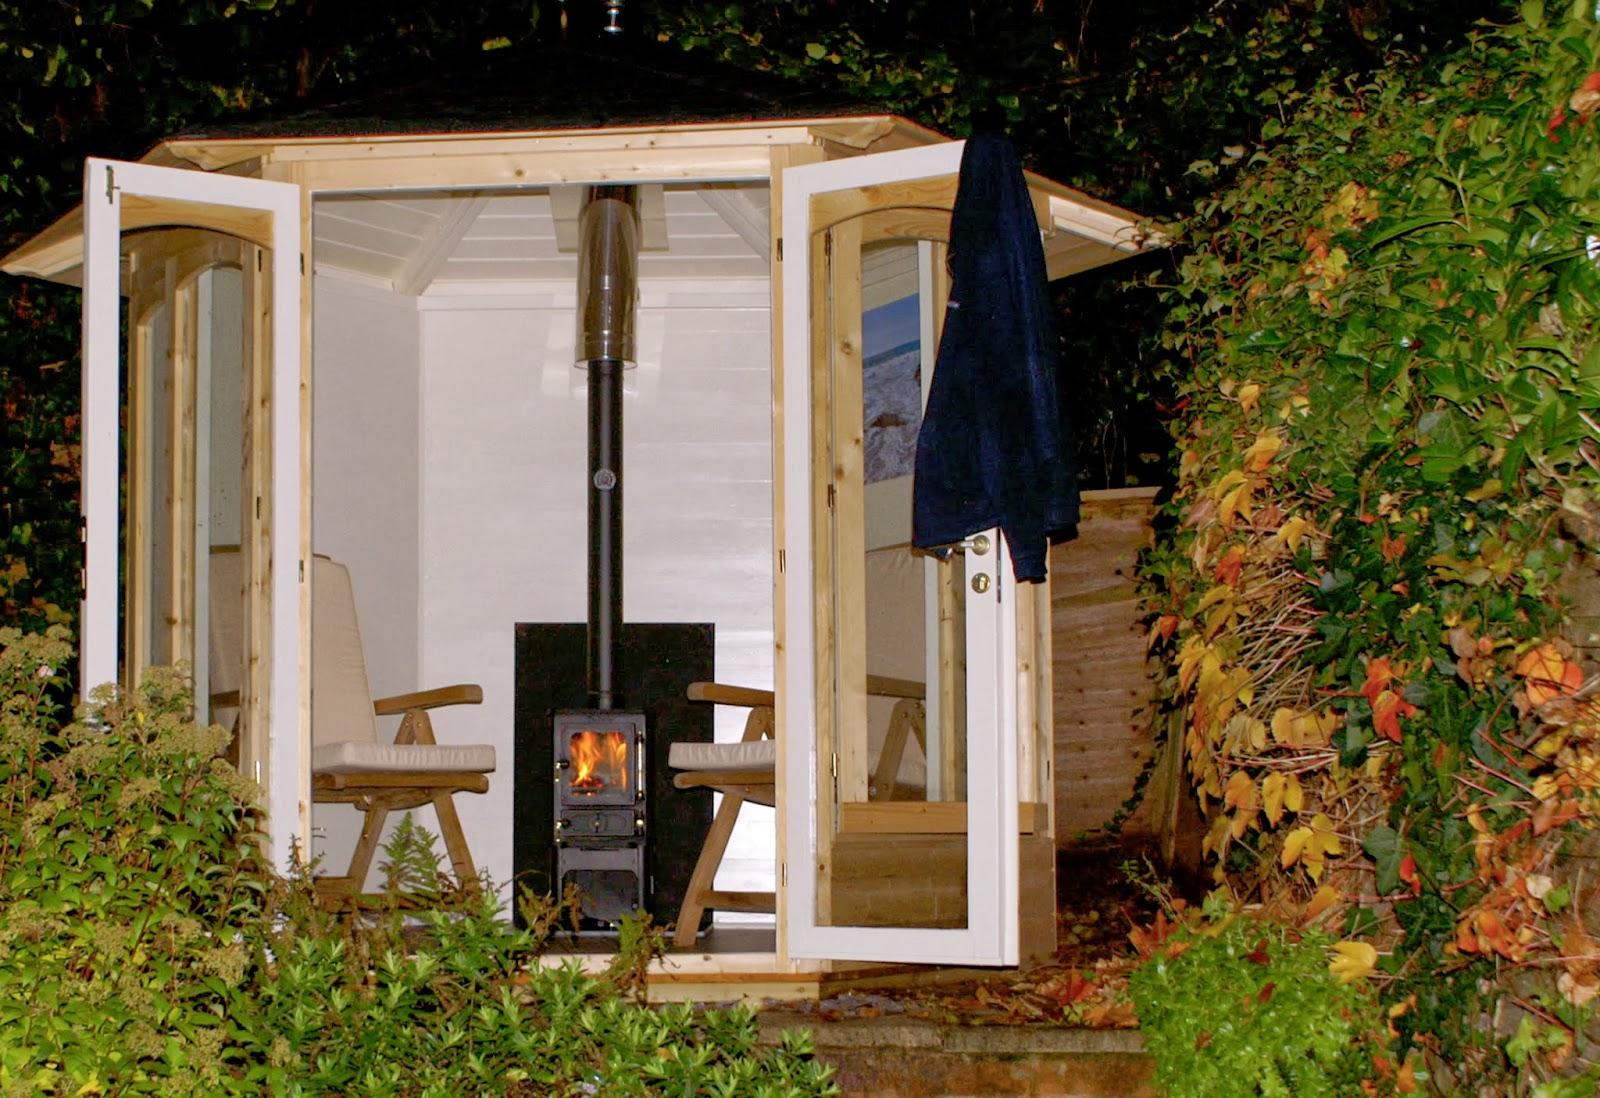 Woodburner Installation In A Summerhouse